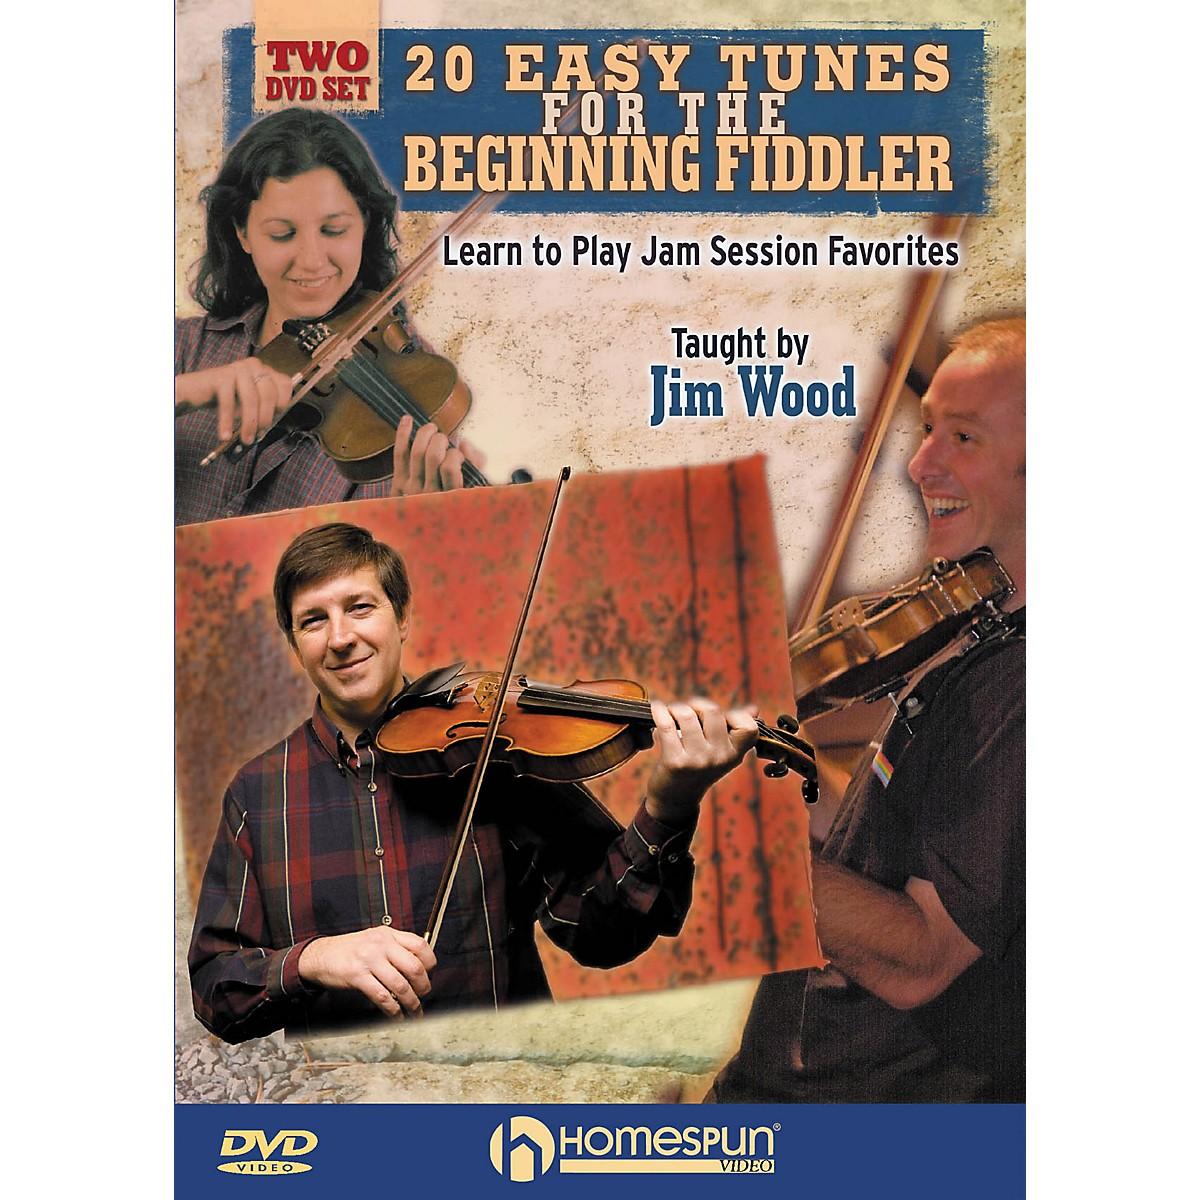 Homespun 20 Easy Tunes for the Beginning Fiddler Homespun Tapes Series DVD Written by Jim Wood